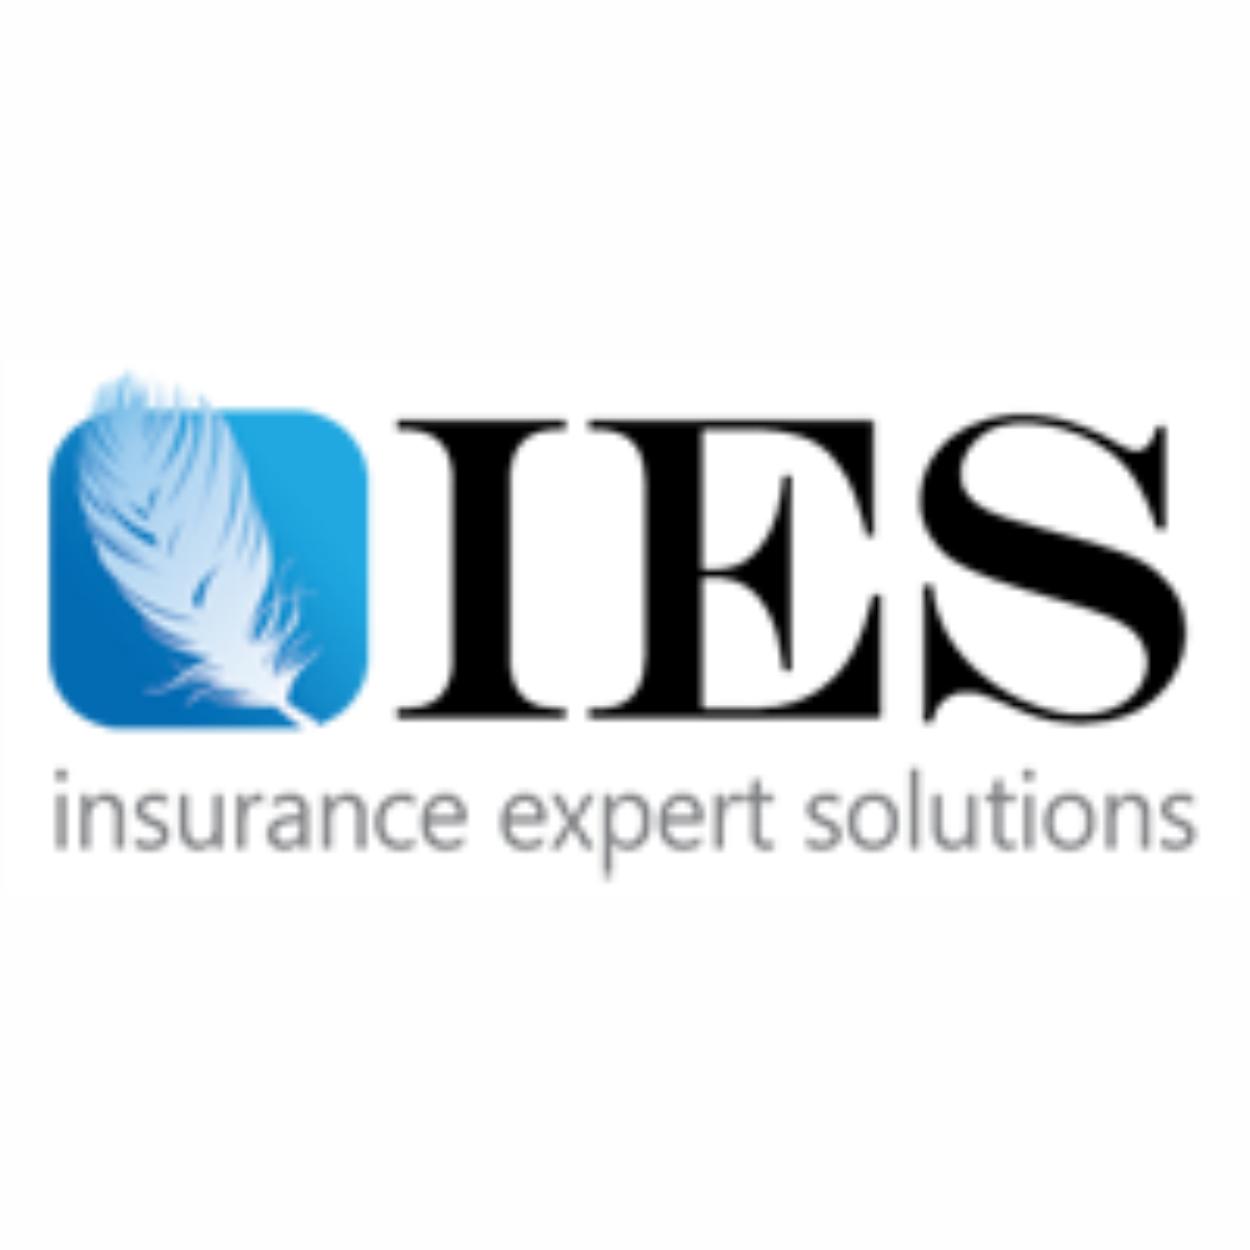 Insurance expert solutions